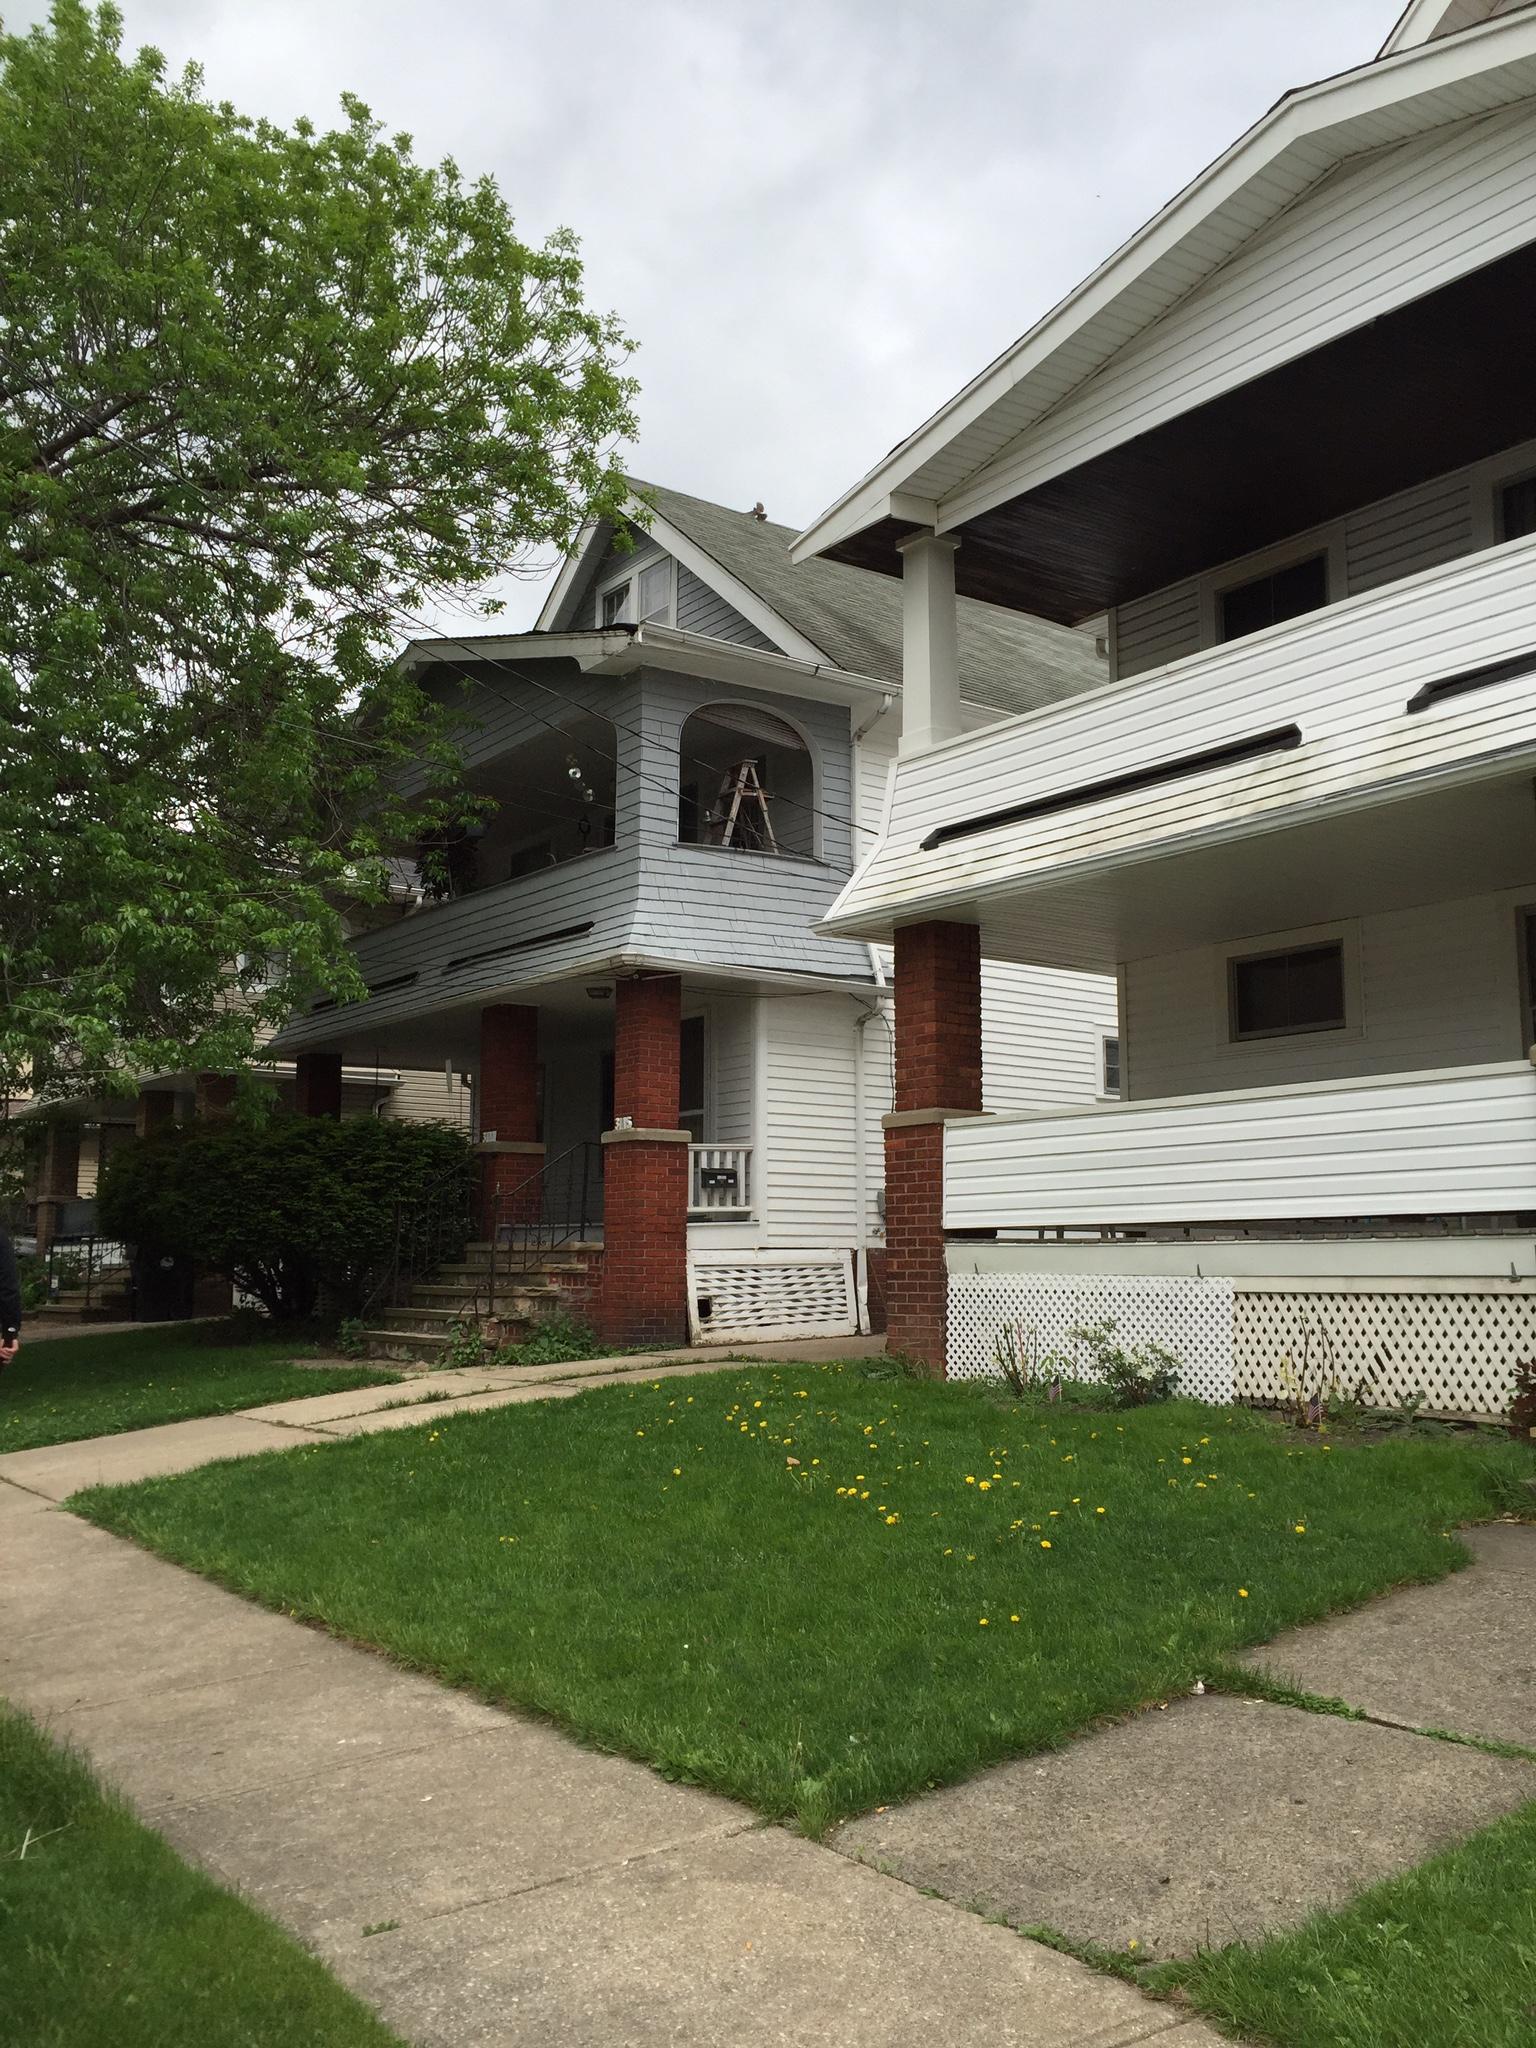 Evaluate Rental Property Like a Pro - The Frugal Vagabond